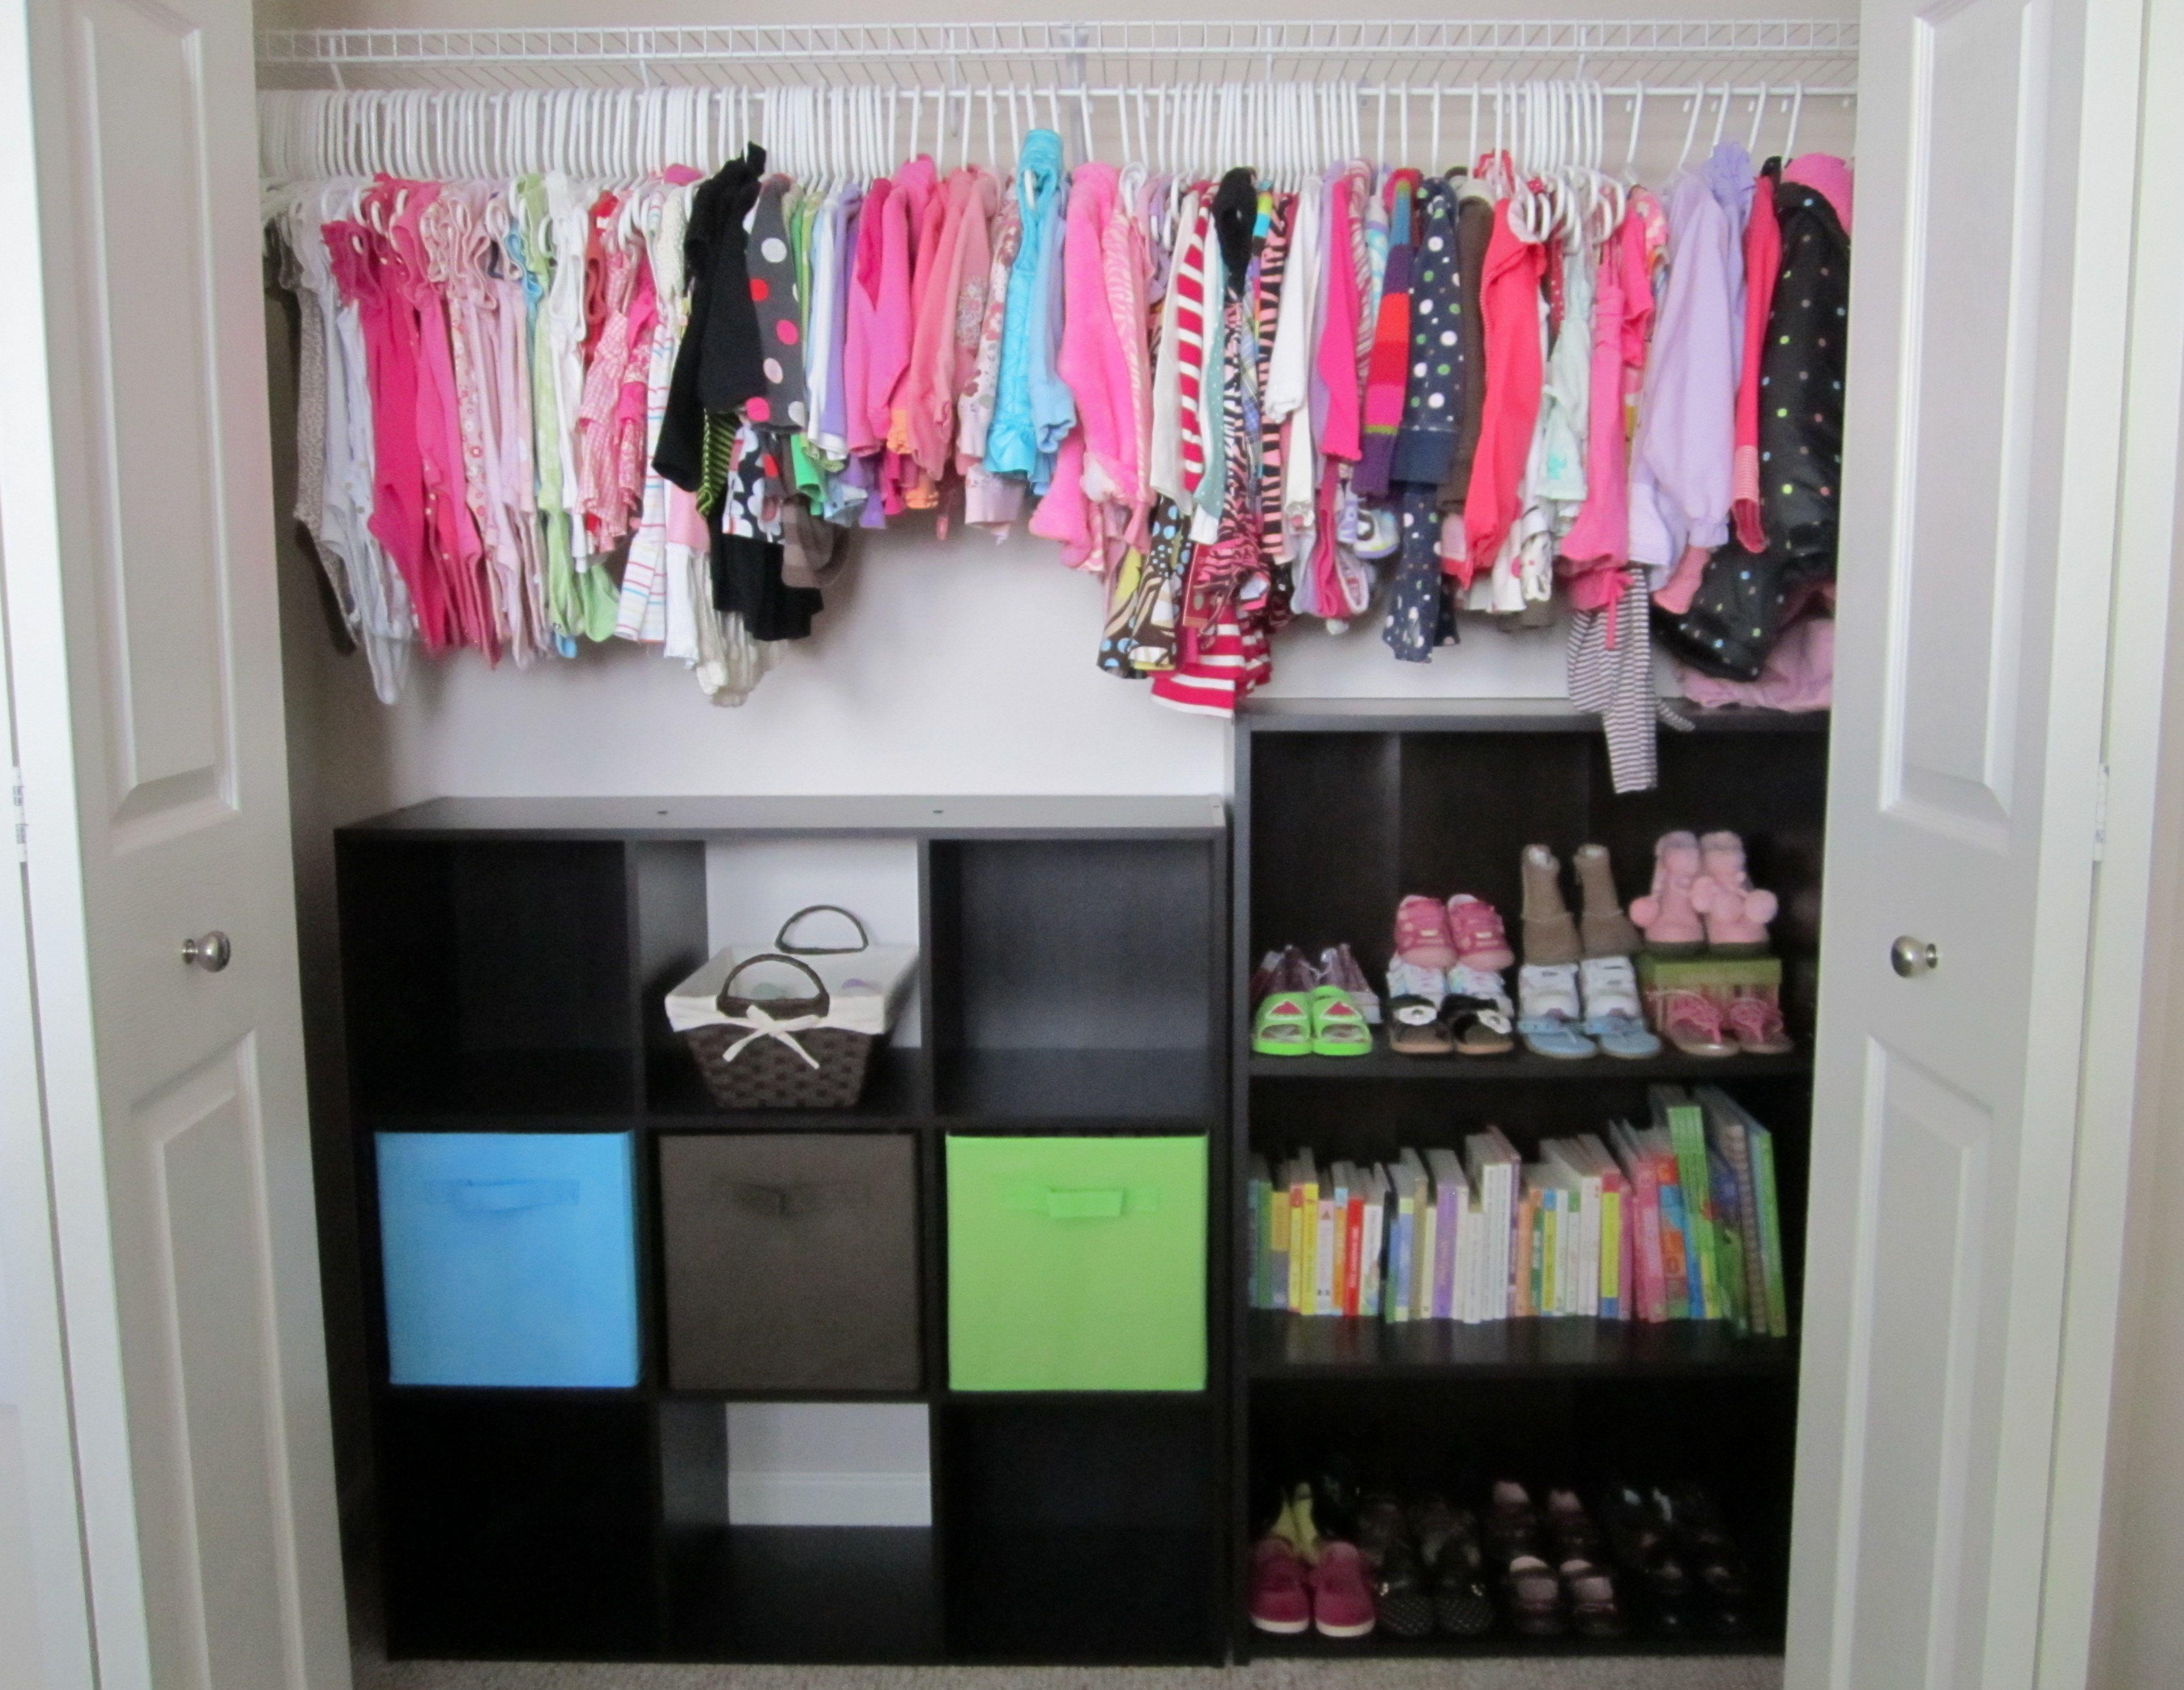 Closet organization - http://www.target.com/p/3x3